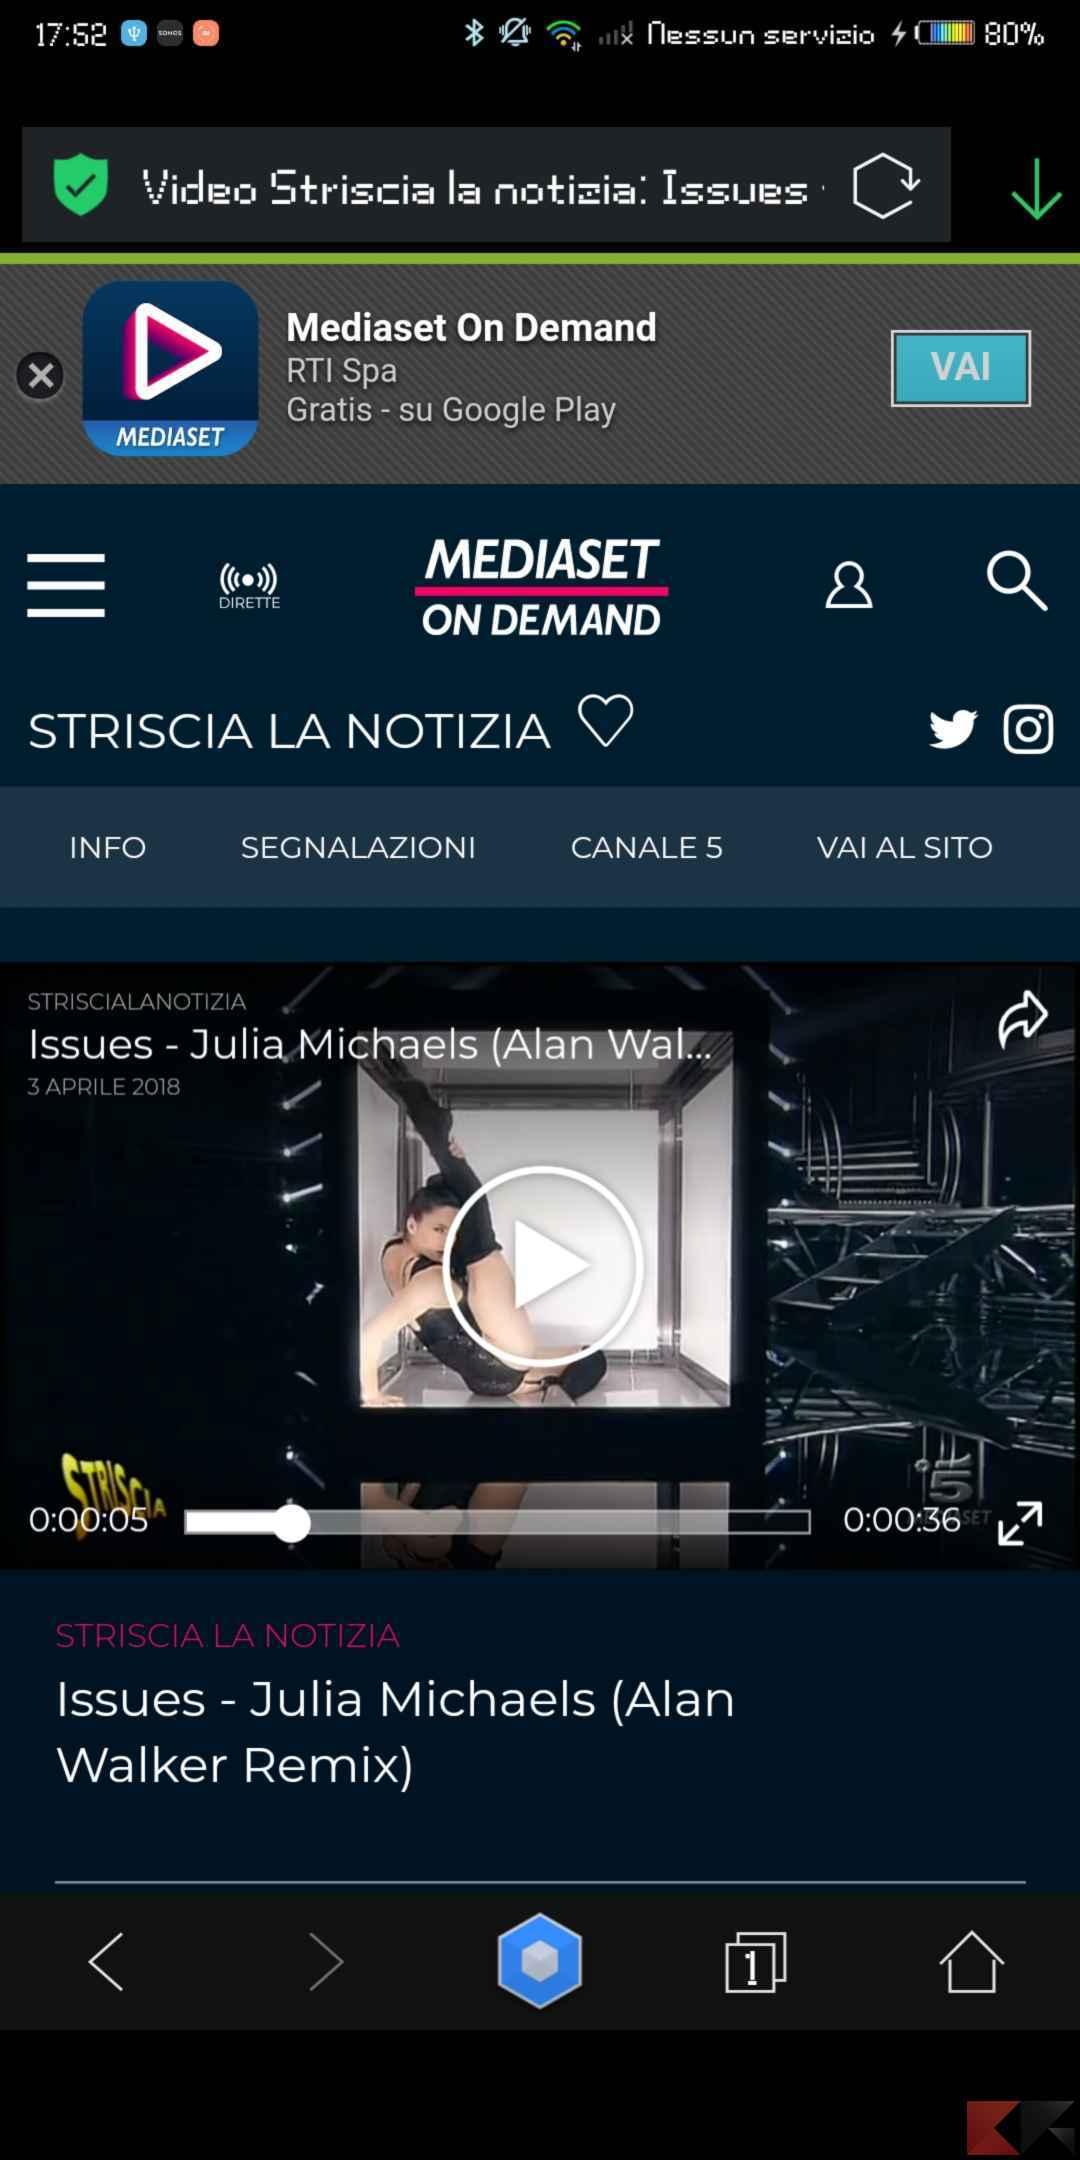 Download Mediaset Play per Android gratis - Nuova versione ...